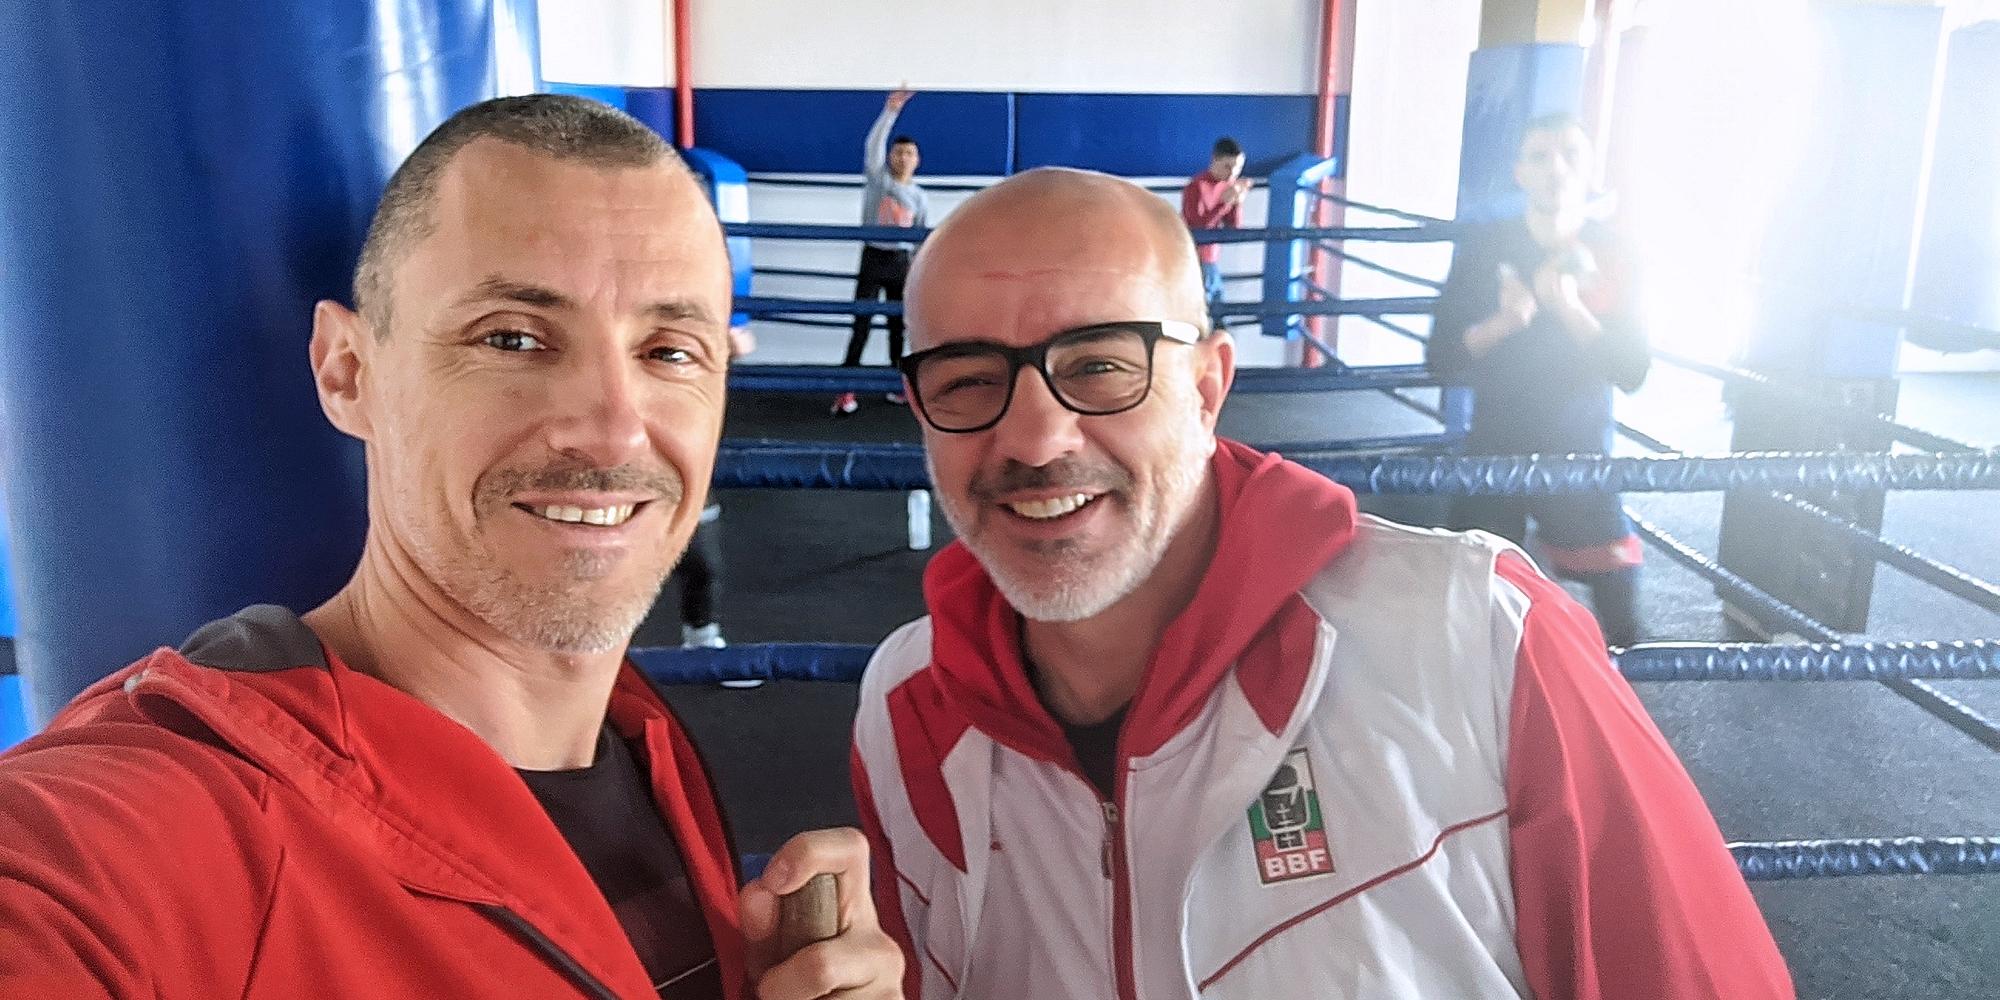 Младежите ни по бокс вече работят с кондиционния треньор Милко Георгиев